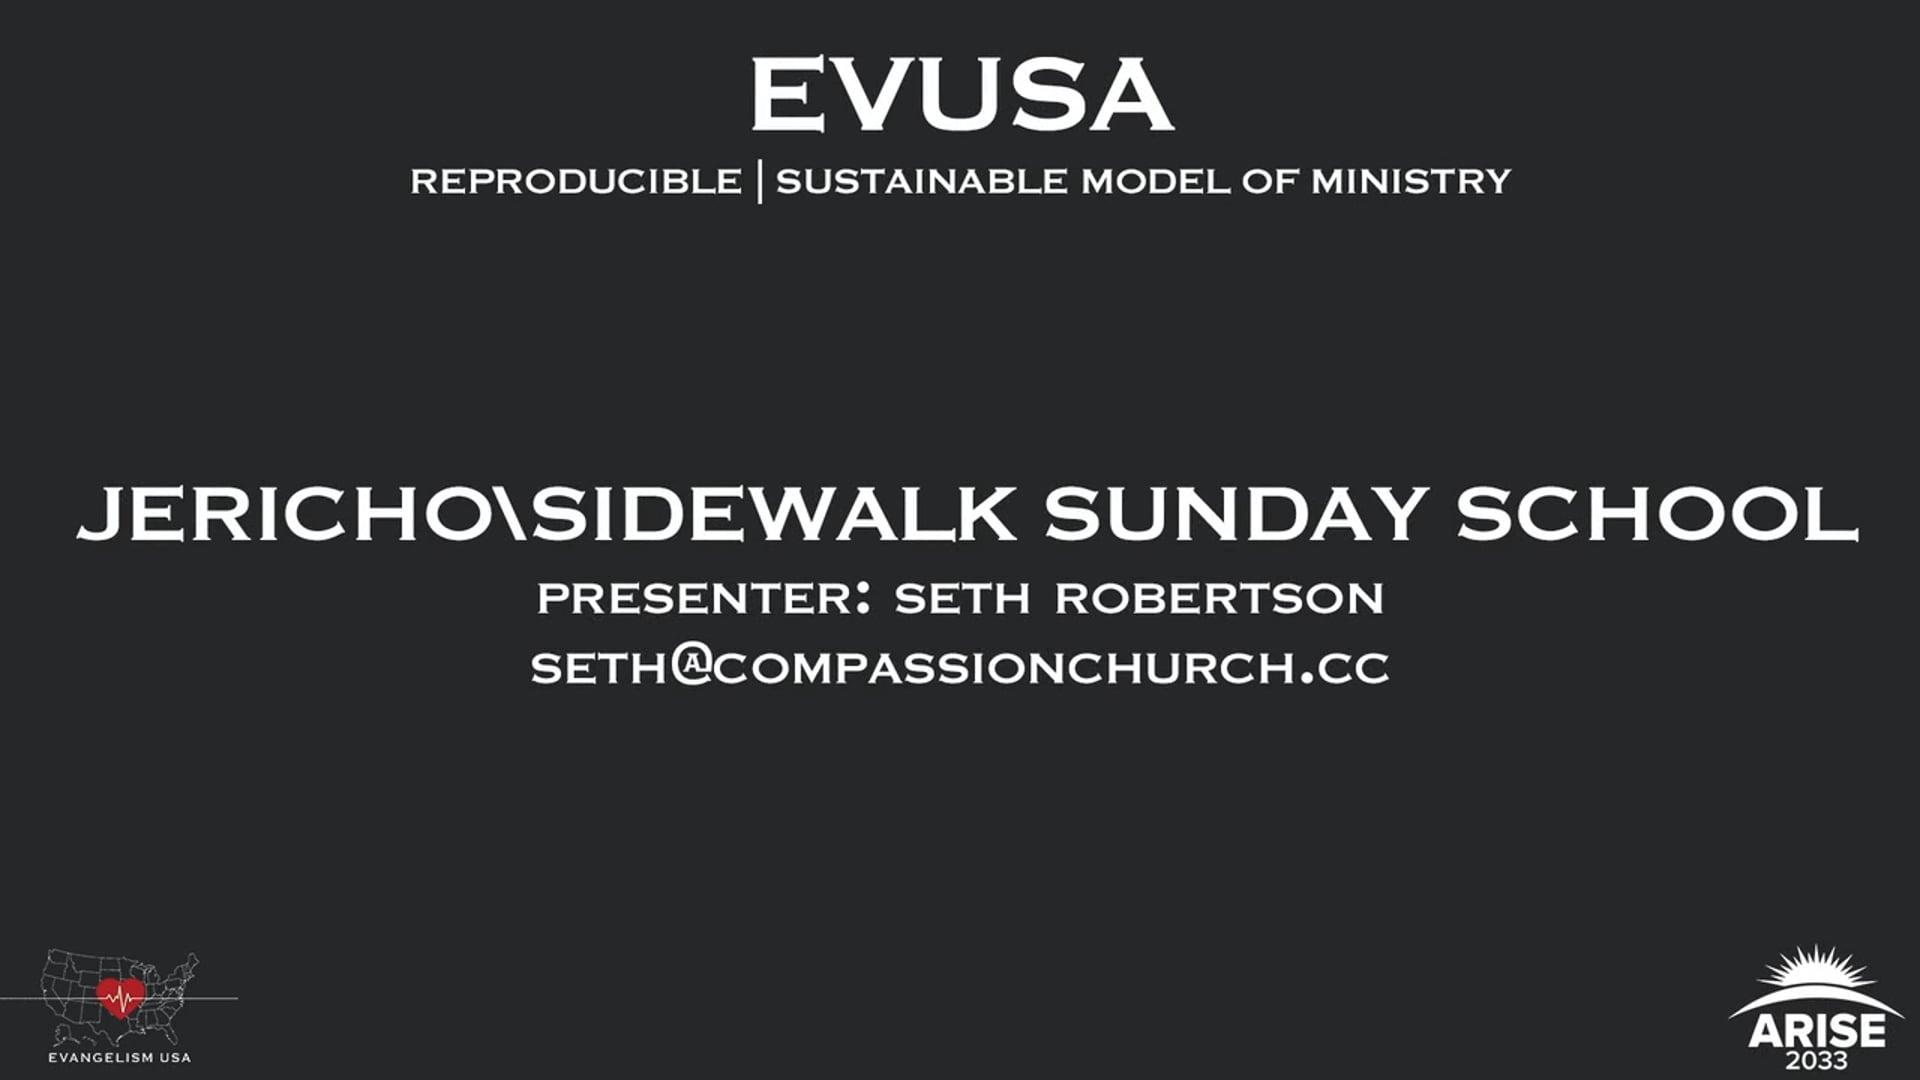 Jericho/Sidewalk Sunday School